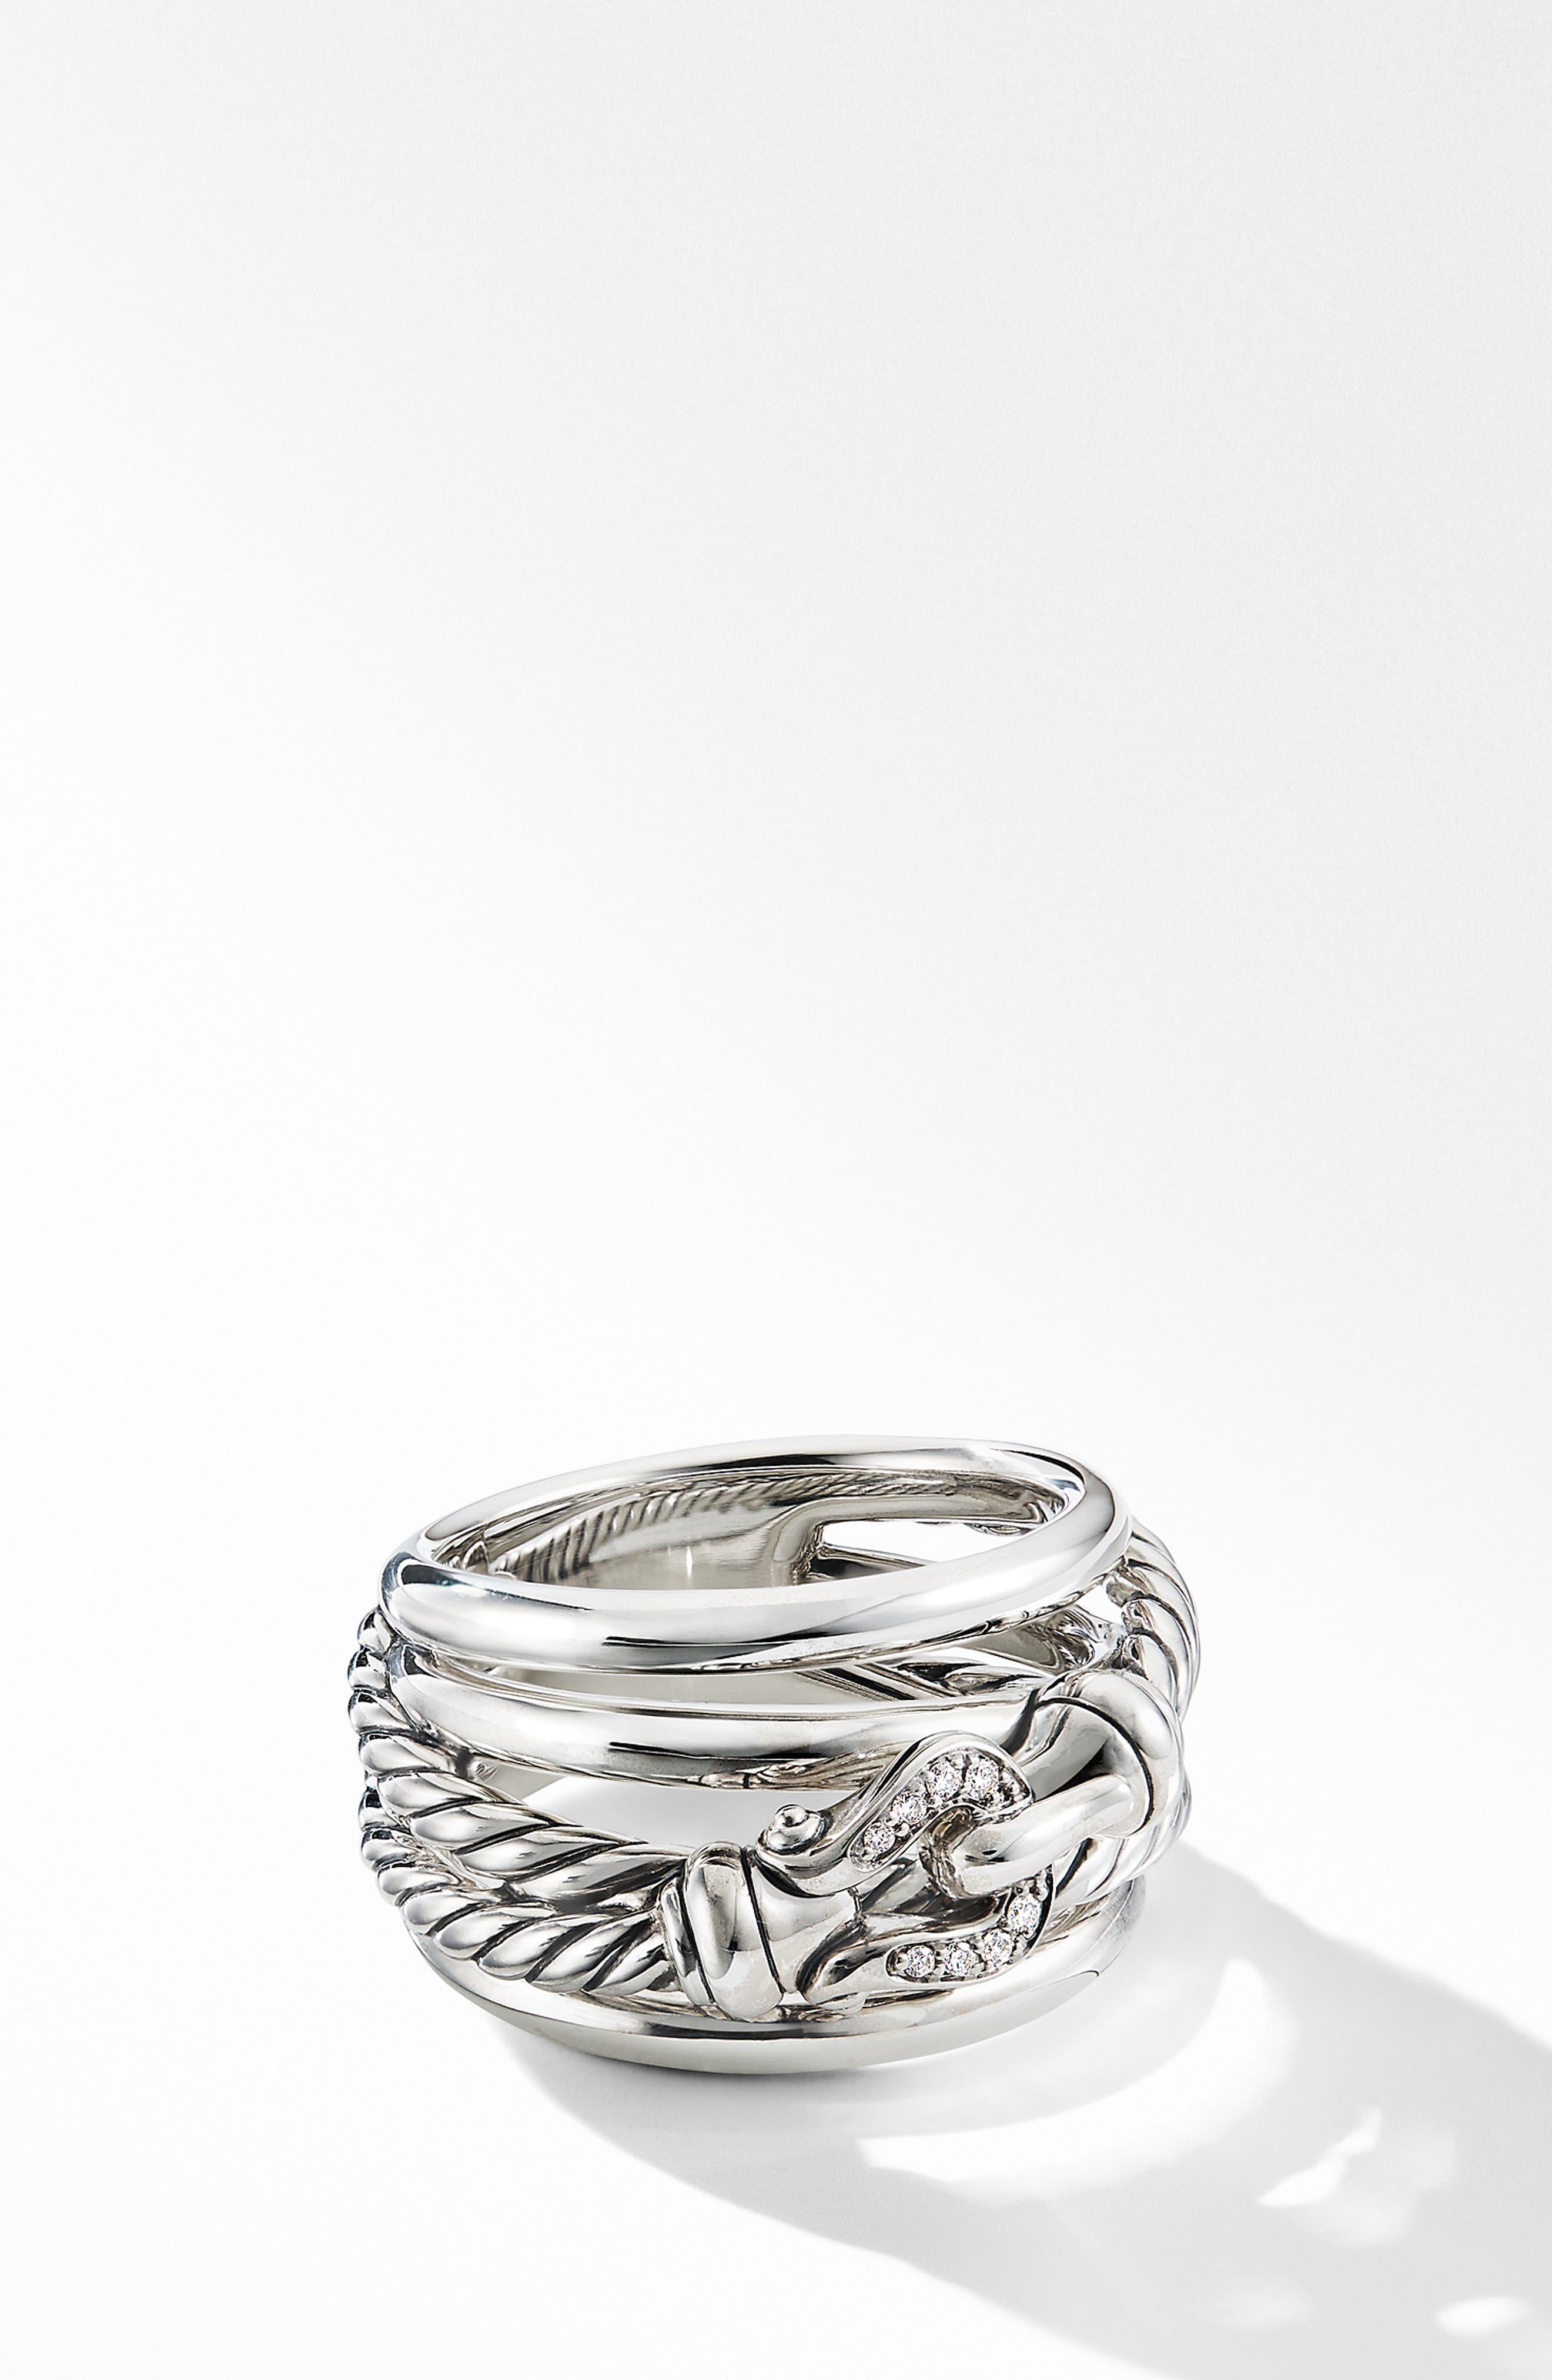 DAVID YURMAN, Buckle Ring with Diamonds, Main thumbnail 1, color, SILVER/ DIAMOND